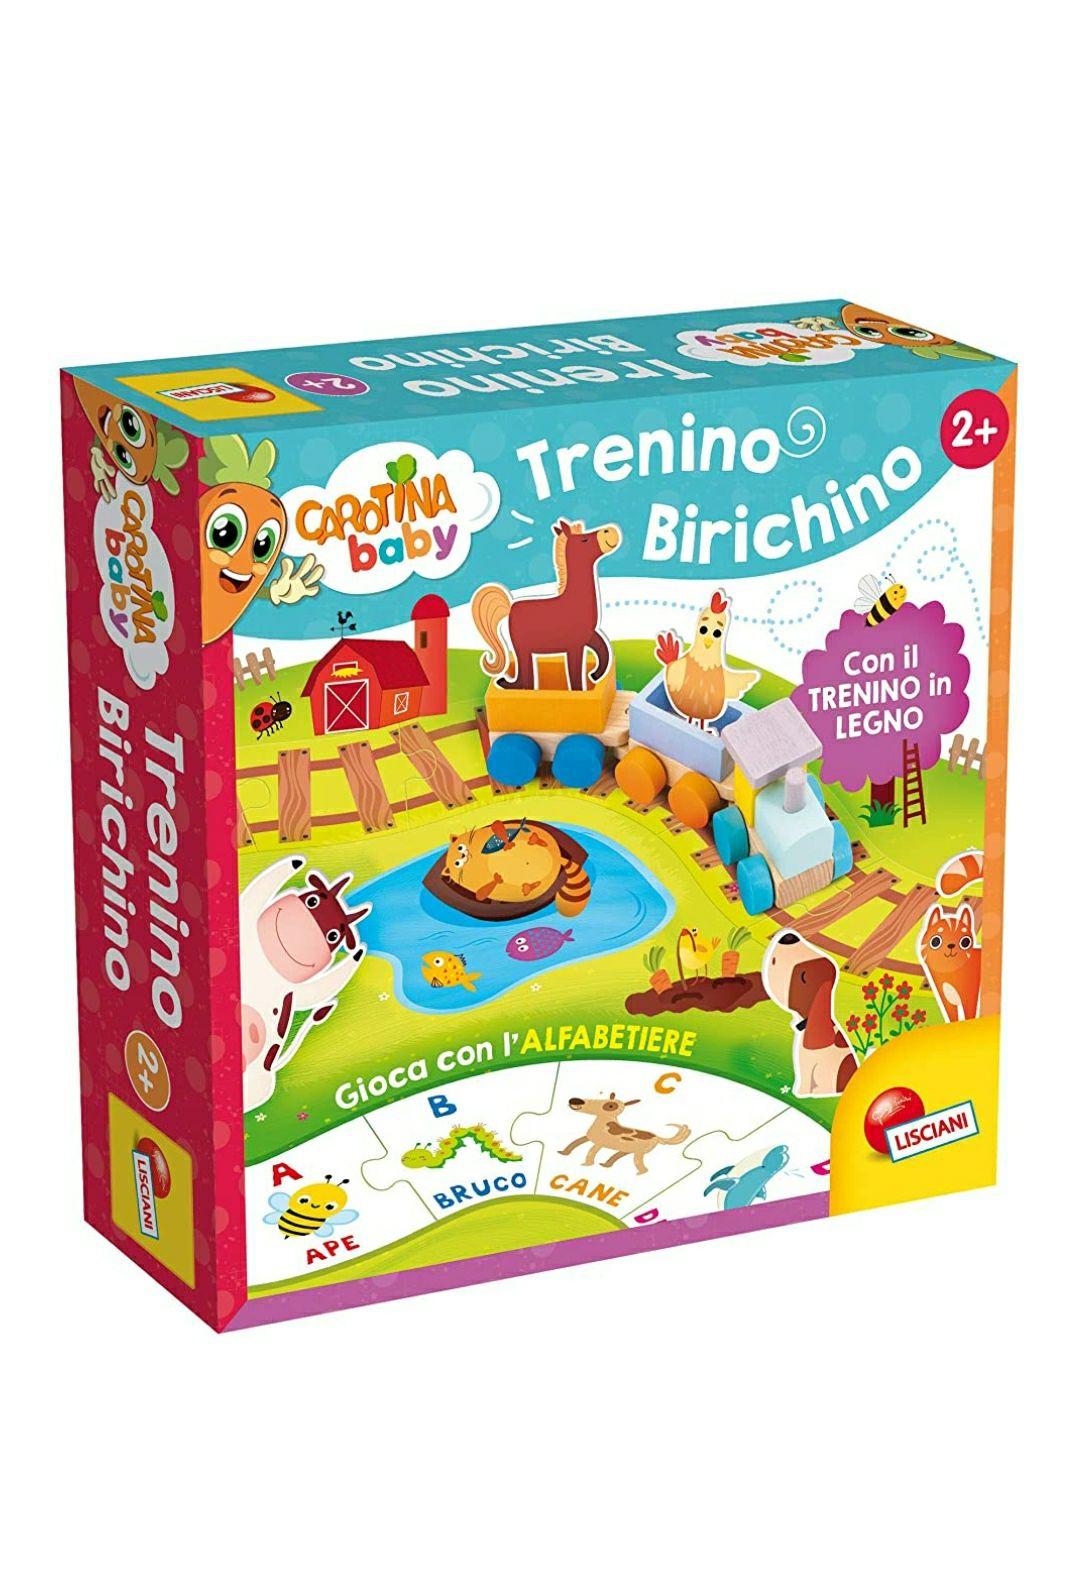 Lisciani giochi- Carotina Baby Trenino Birichino - 84005